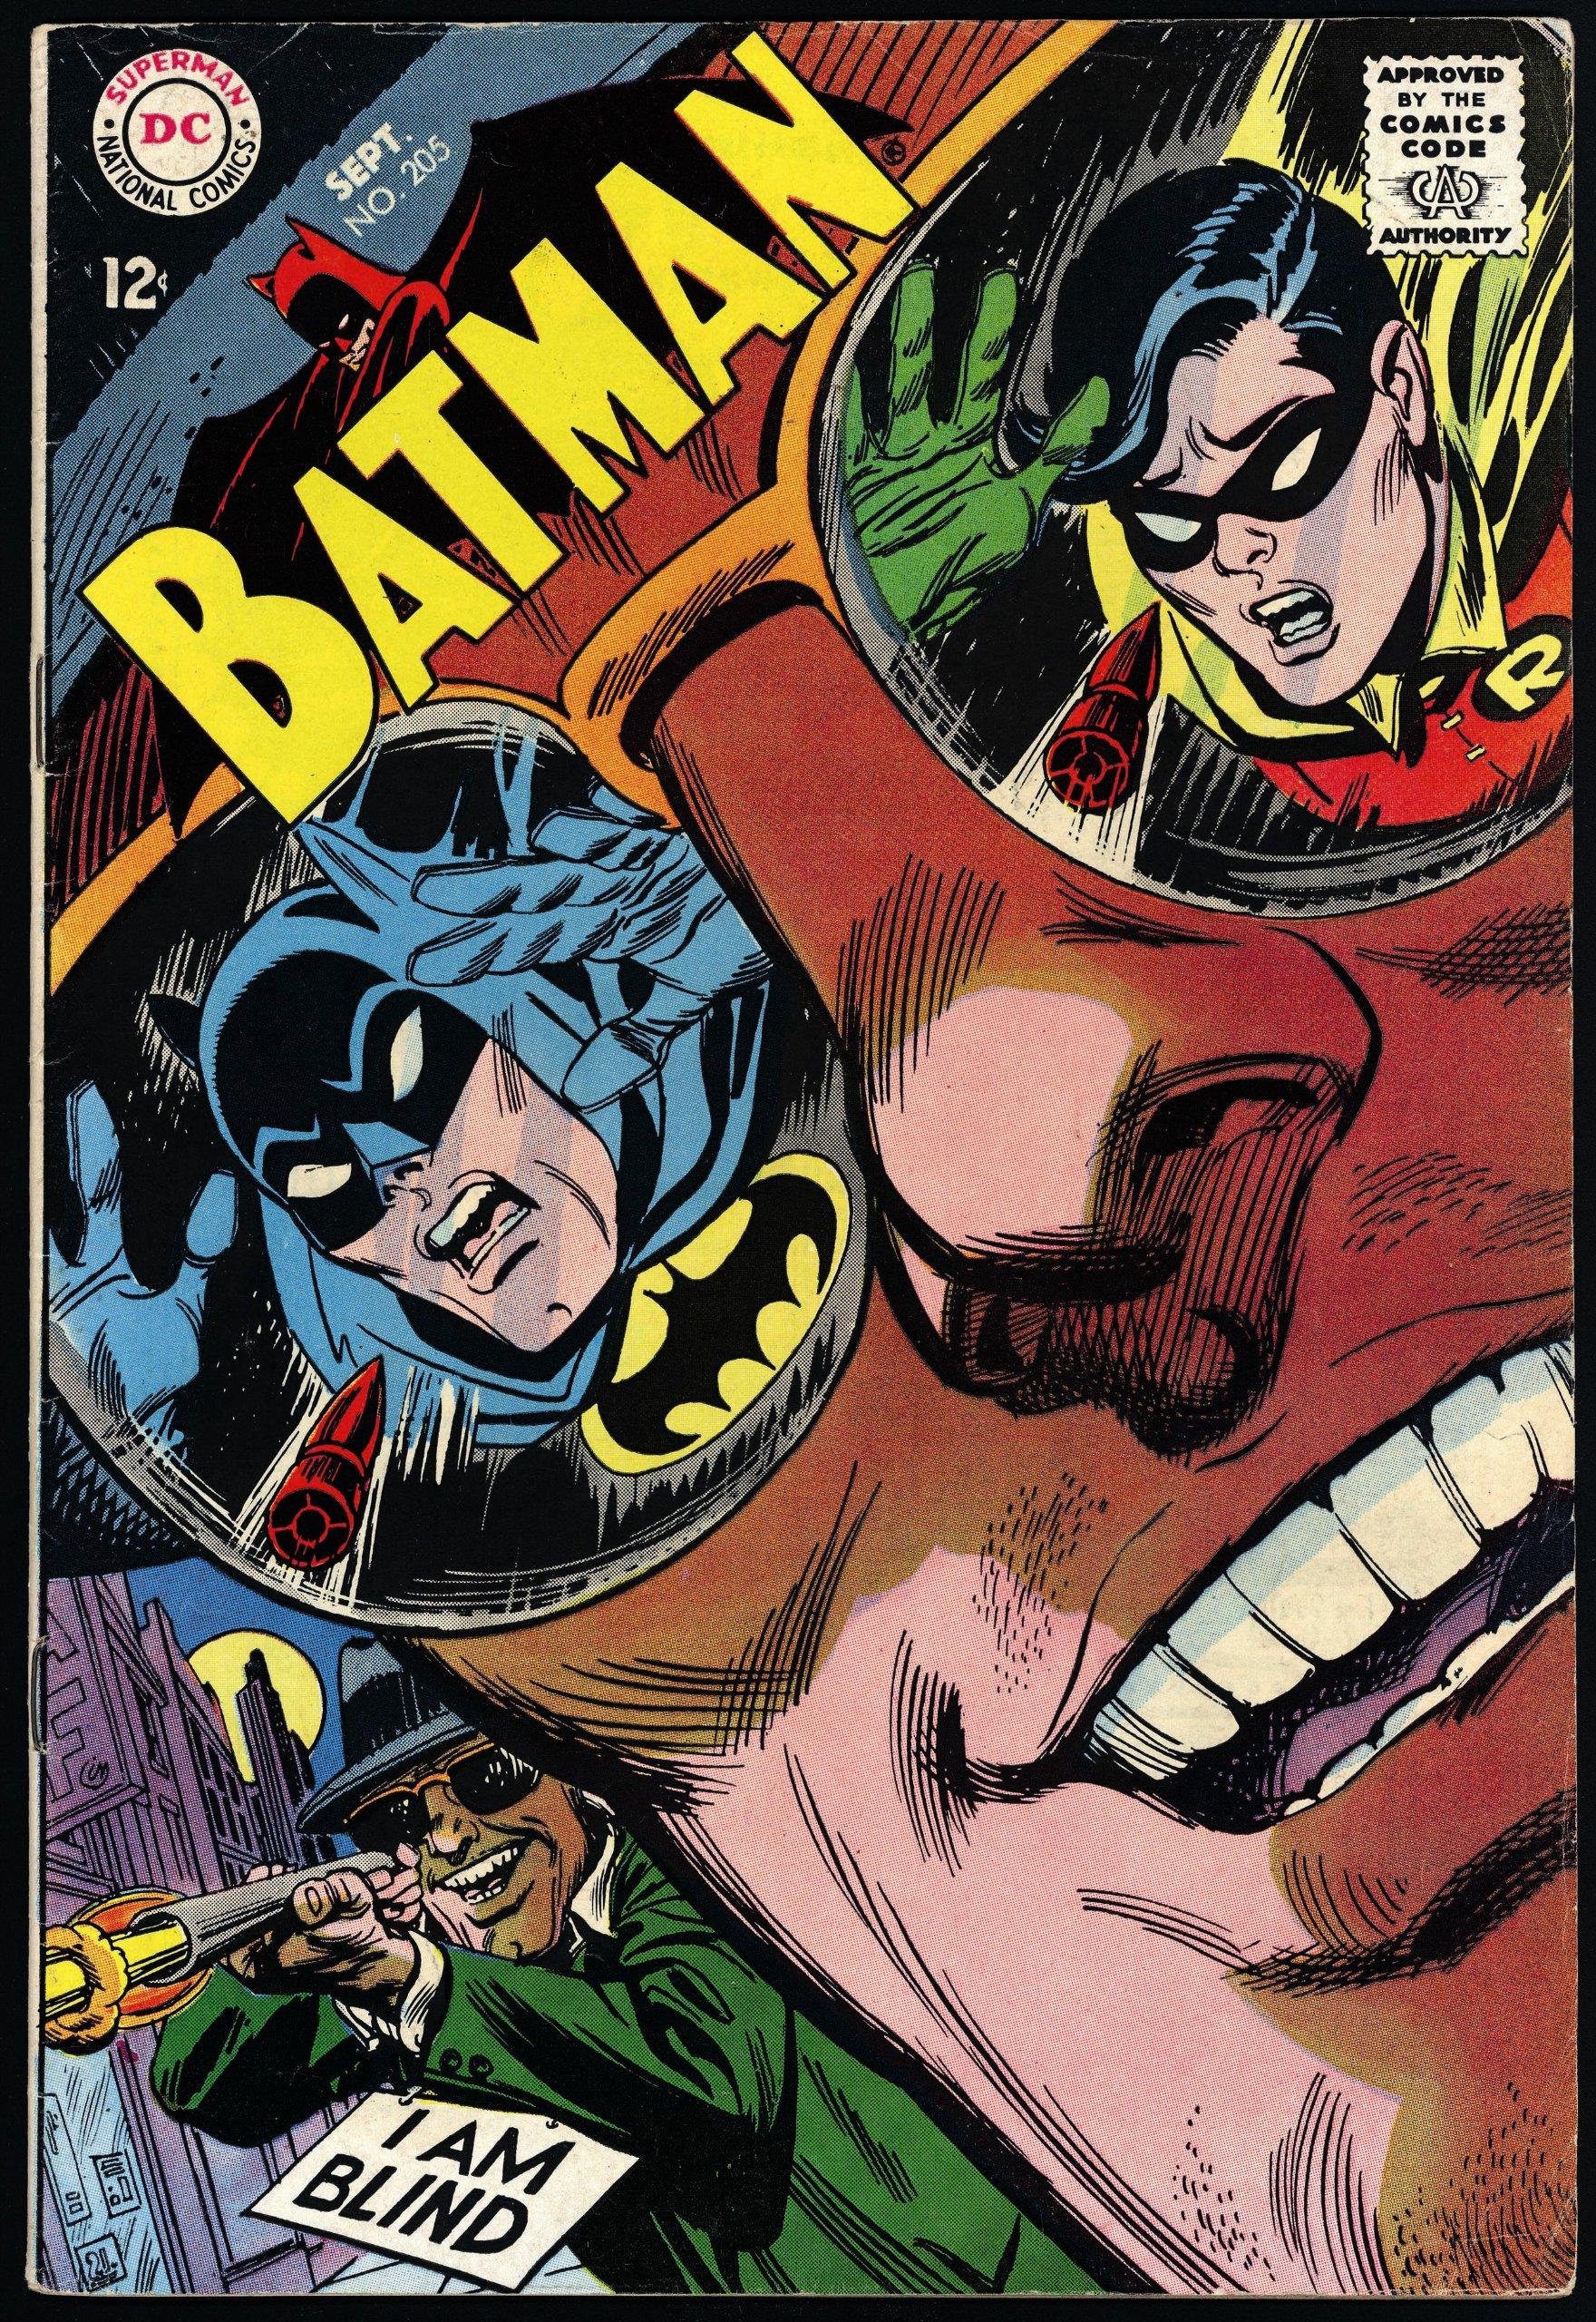 75 Years DC ics The Art Modern Mythmaking Paul Levitz